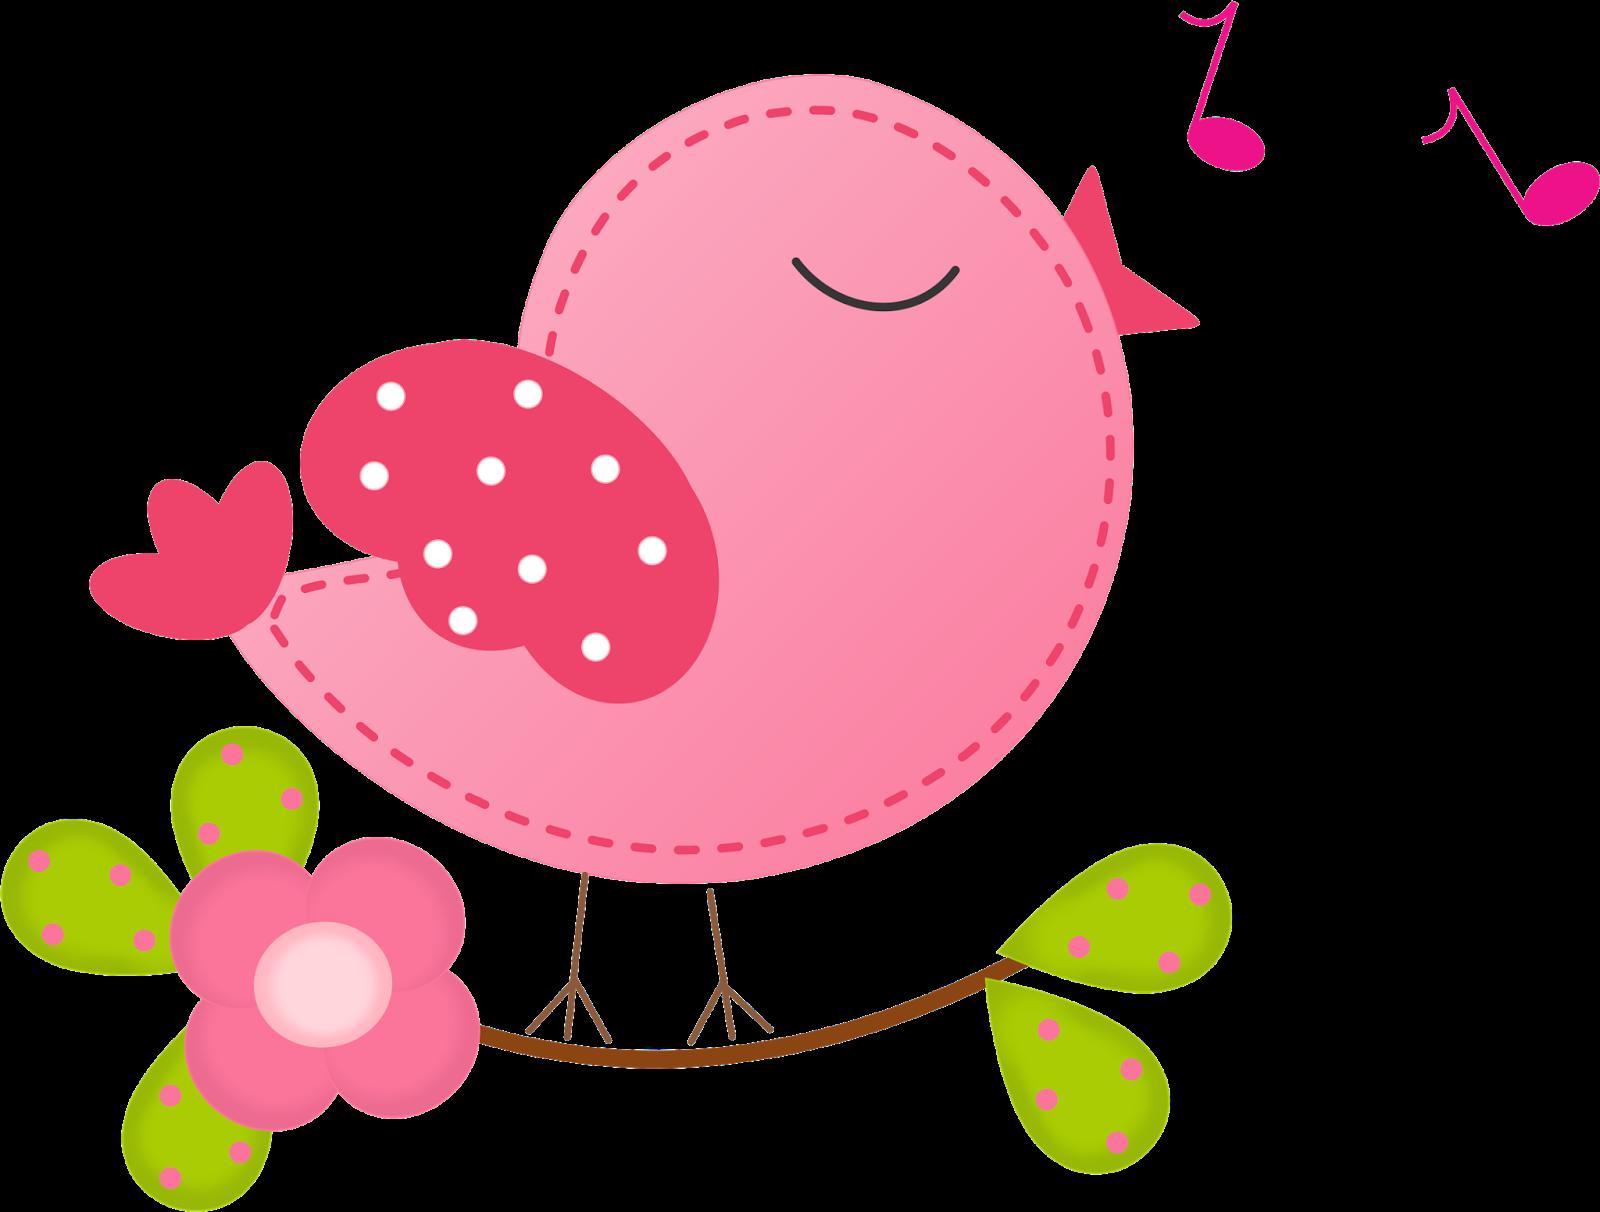 Bird singing clipart jpg royalty free library Beauty Birds Singing Clipart. | صور | Clip art, Baby clip art, Bird ... jpg royalty free library